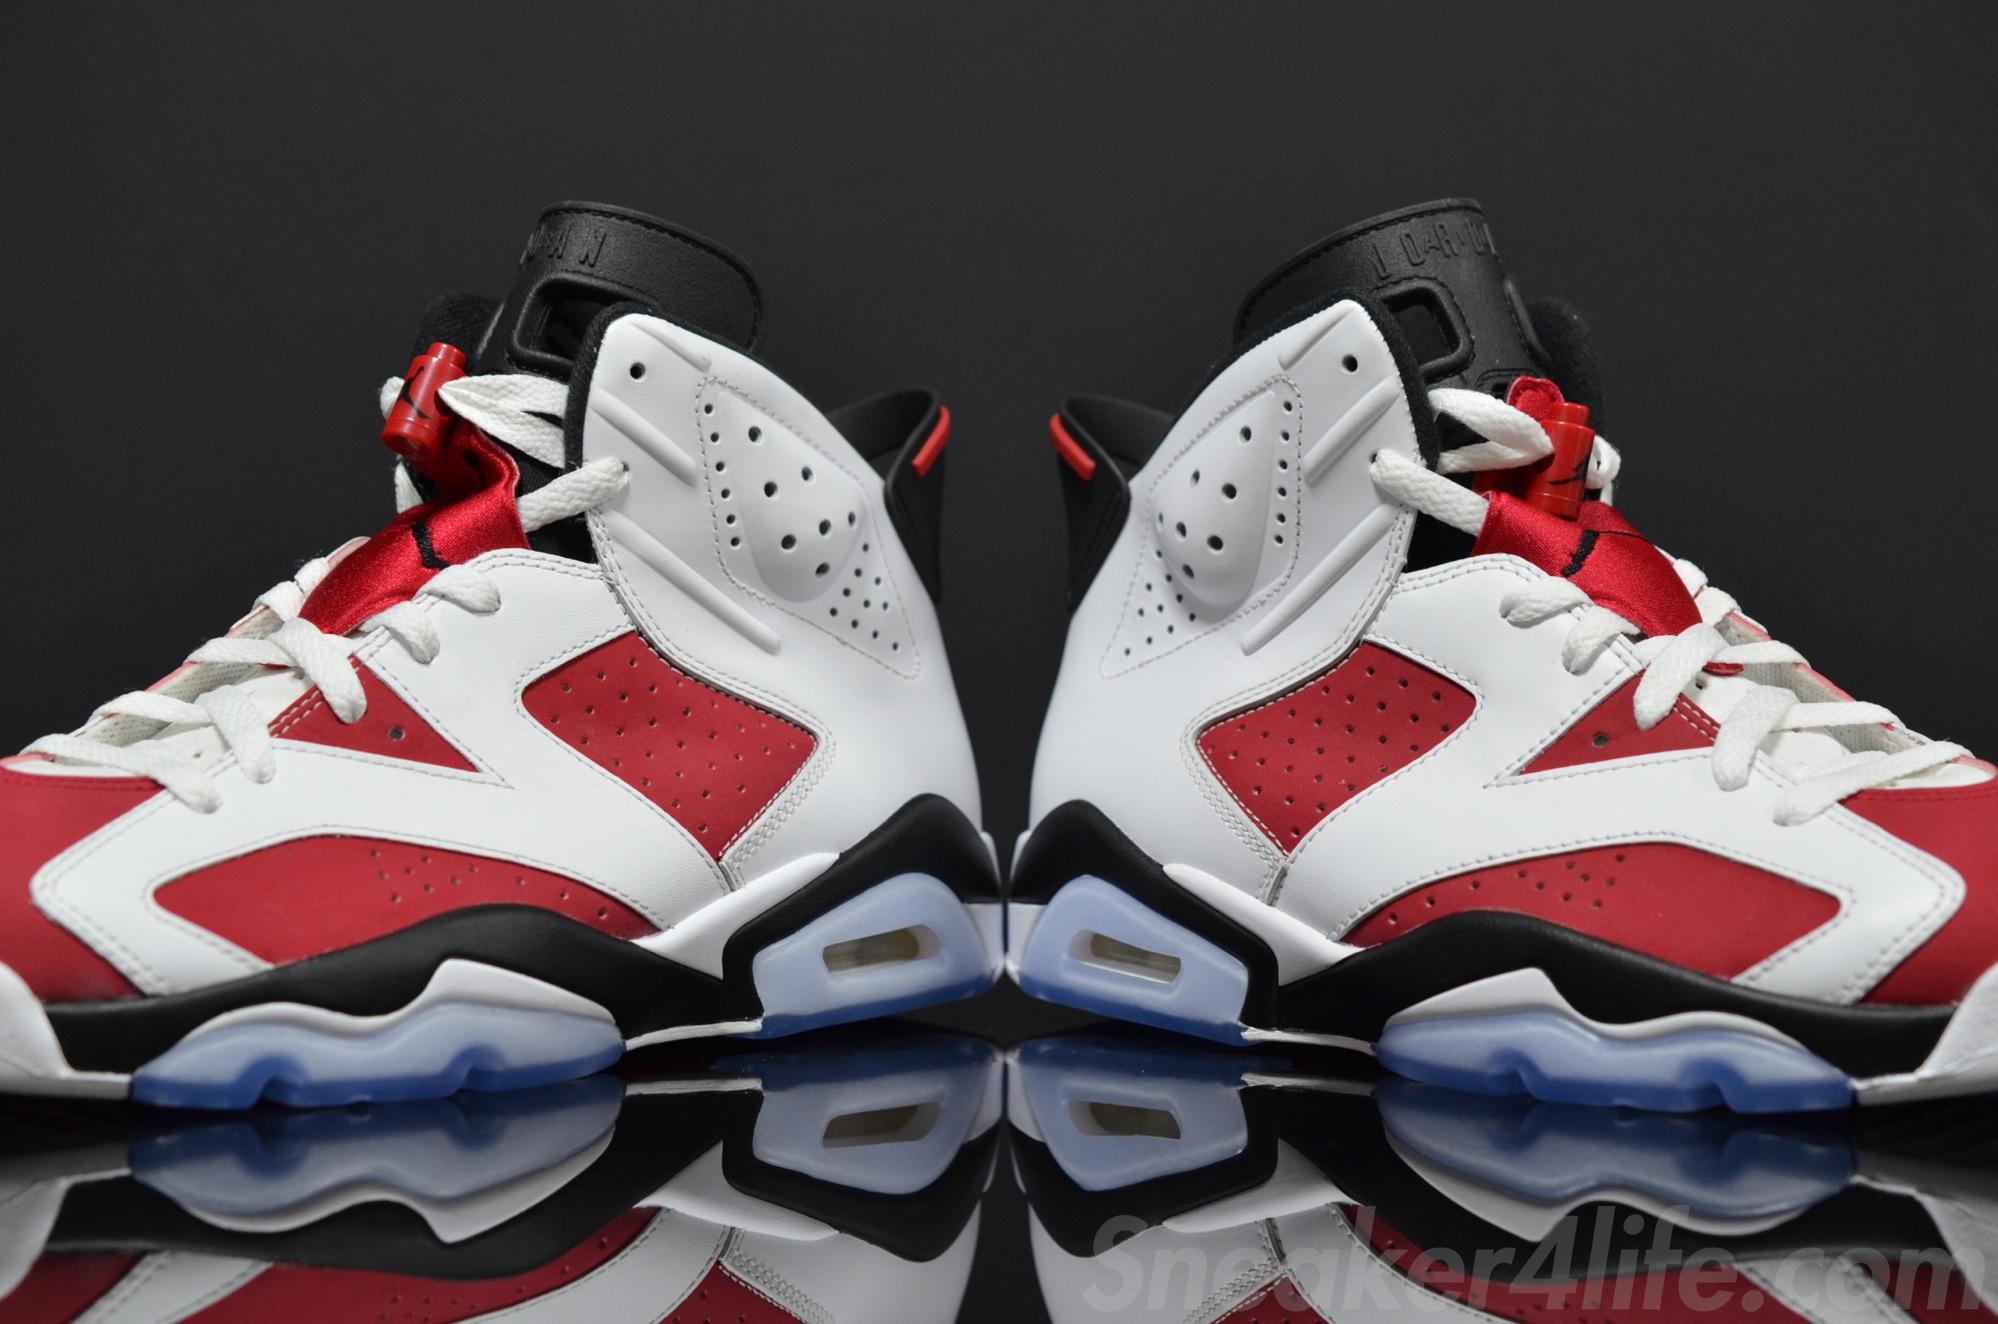 Air Jordan 6 Carmine 2014 384664-160